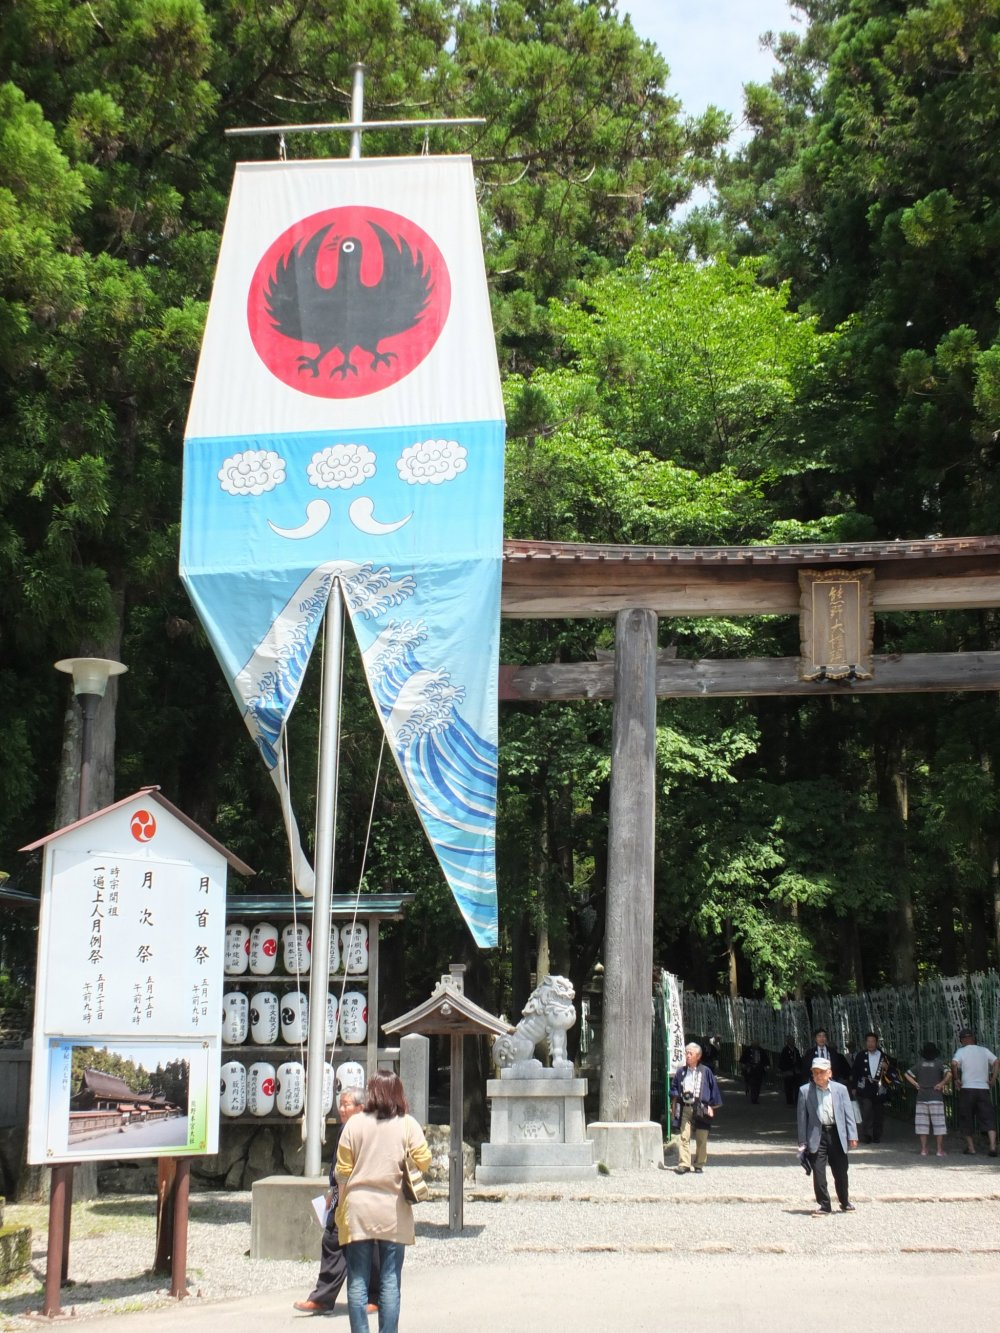 Grand entrance to the shrine